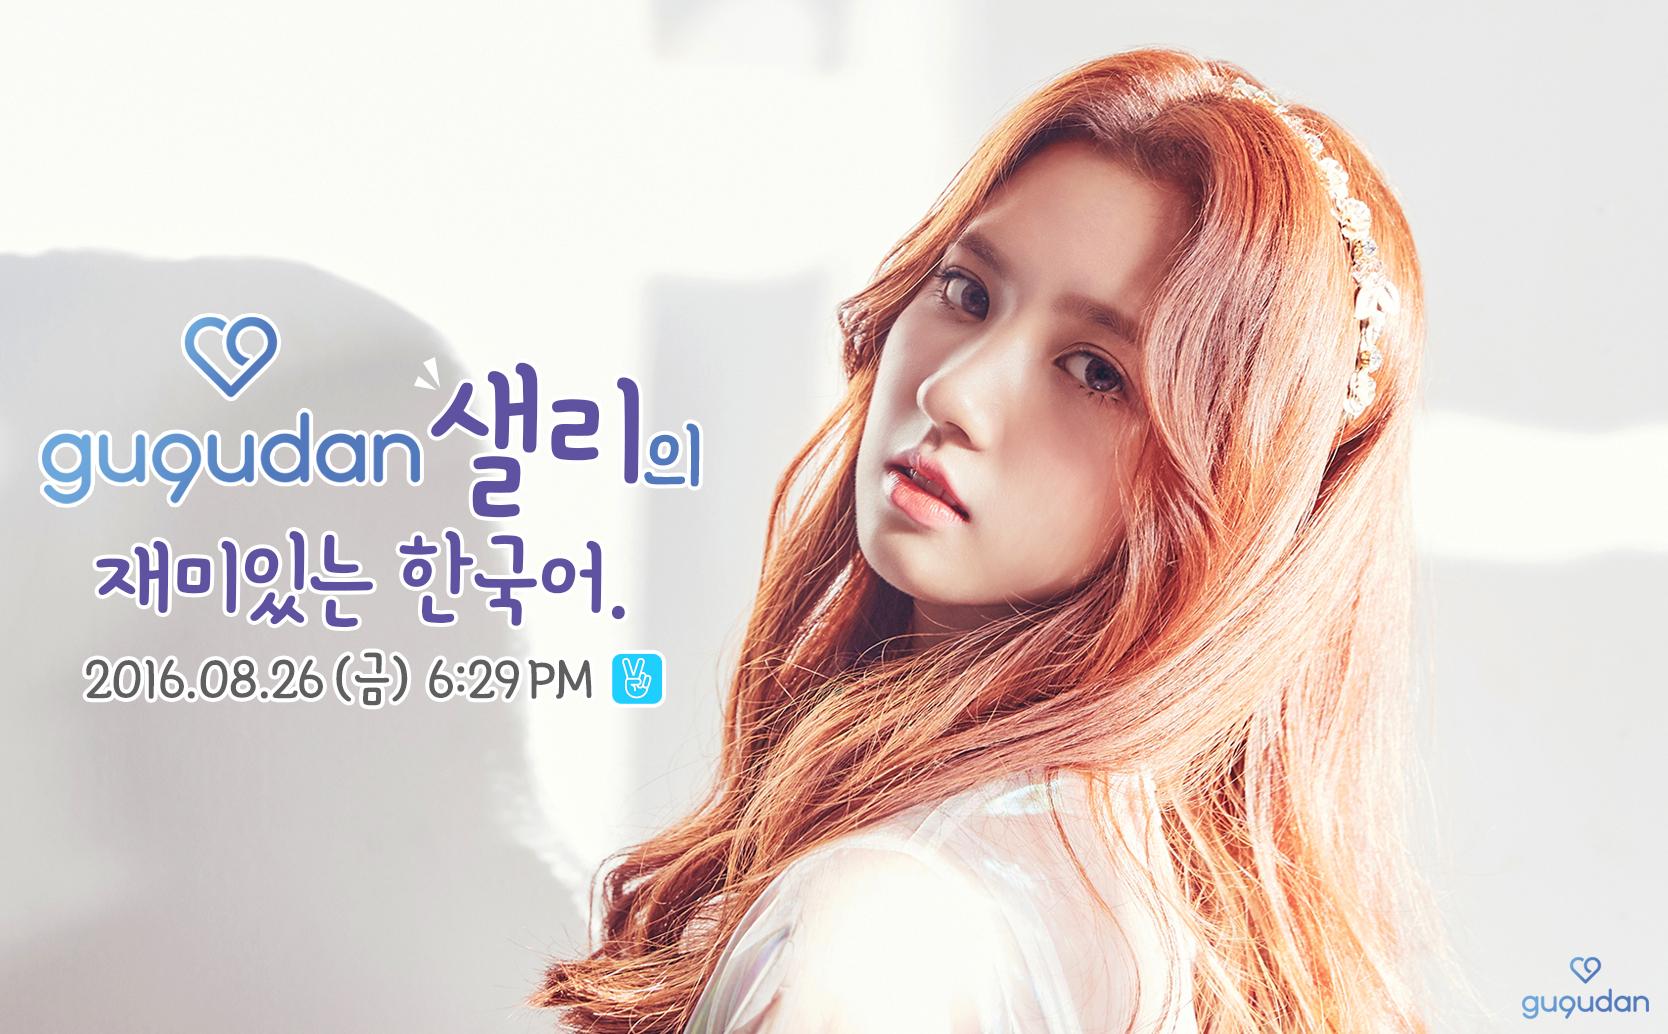 gugudan 샐리의 재미있는 한국어.